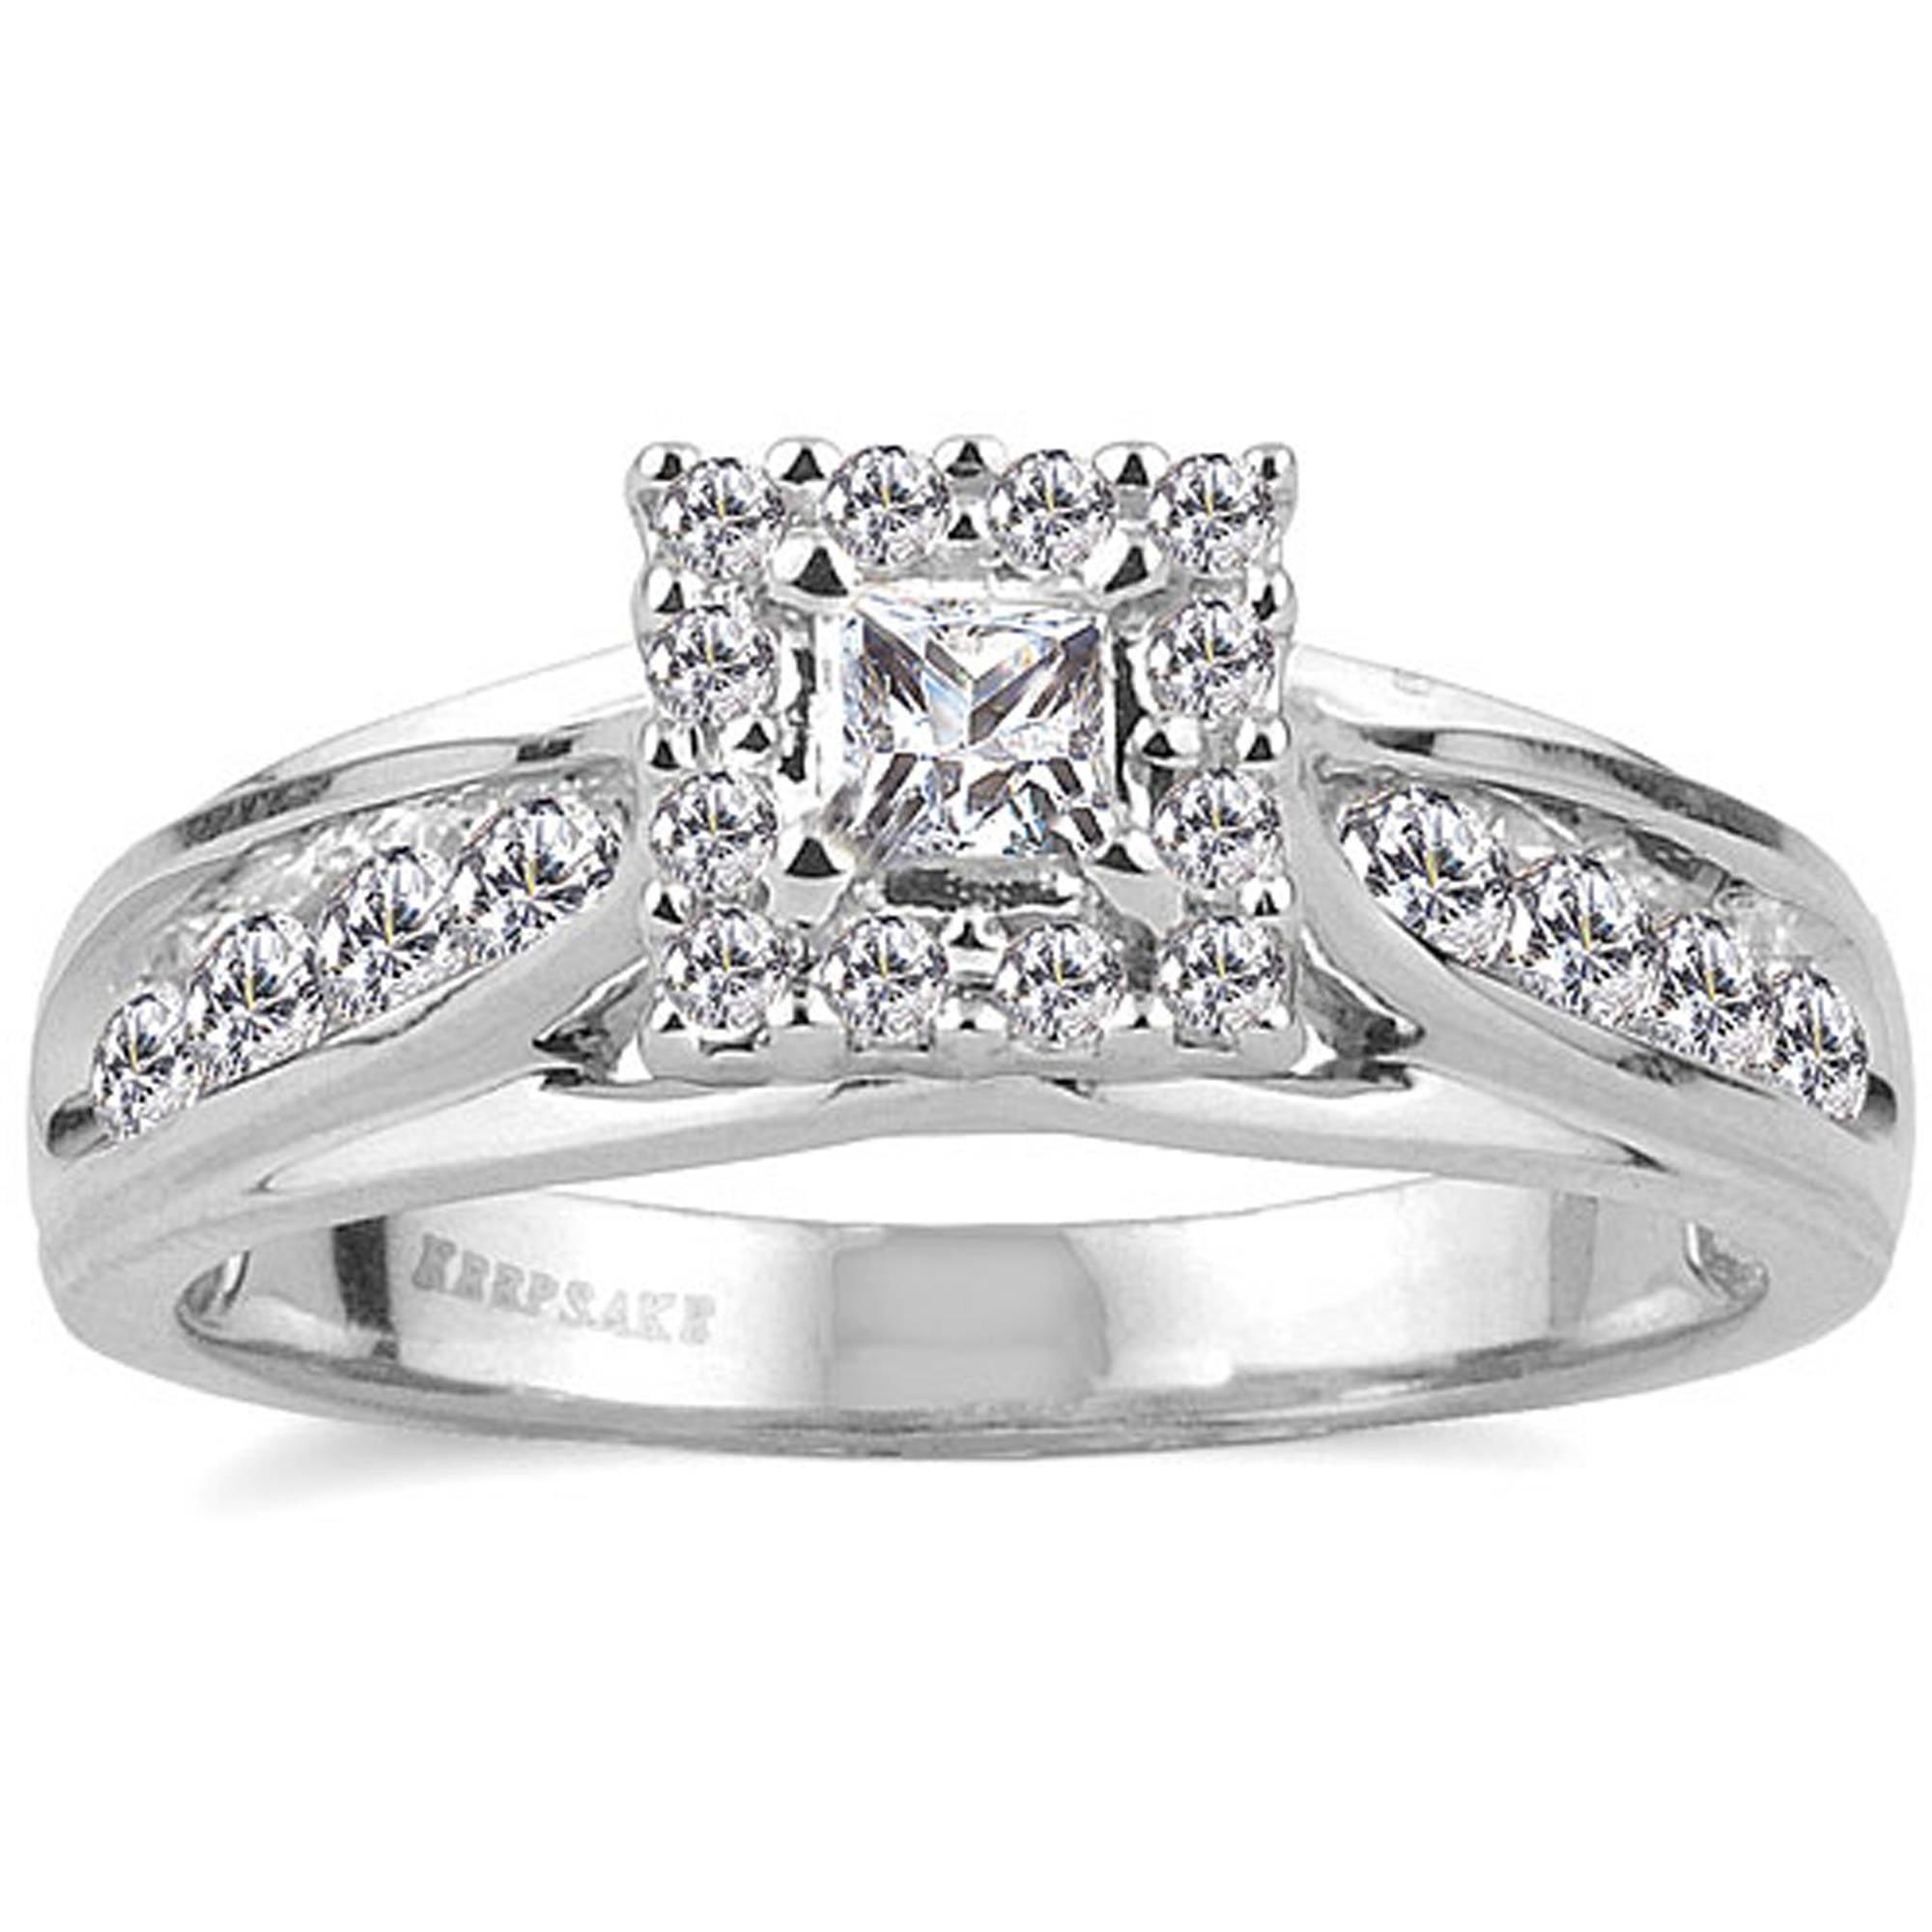 keepsake melody 1/2 carat t.w. certified diamond 10kt white gold